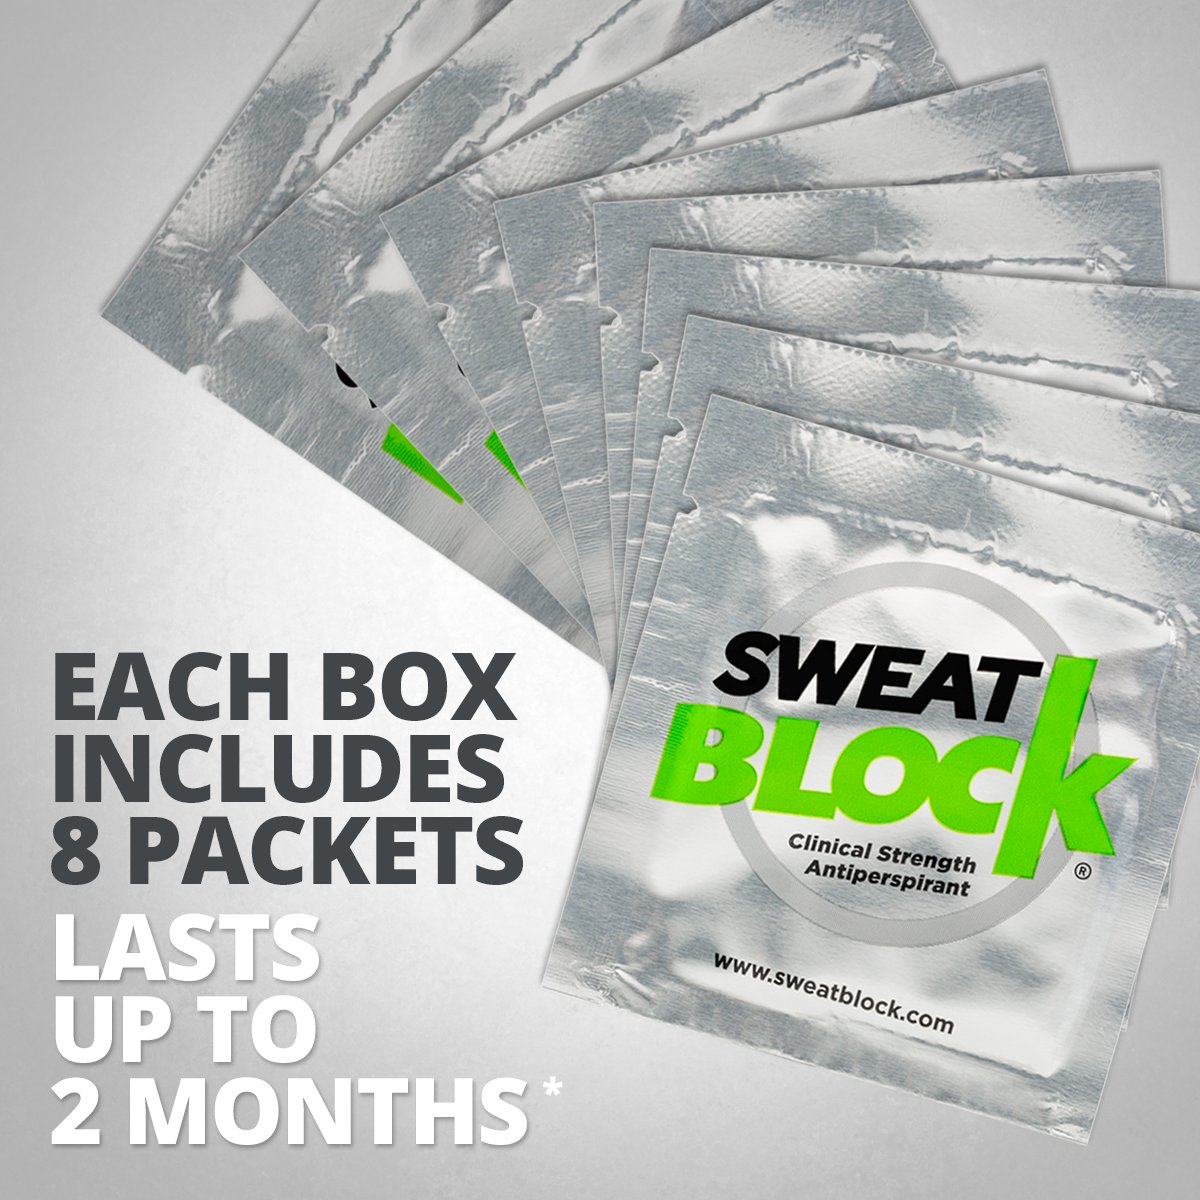 Sweatblock Antiperspirant Clinical Strength Reduce Maxim Deodorant Rol On Sweat Up To 7 Days Per Use Block Beauty